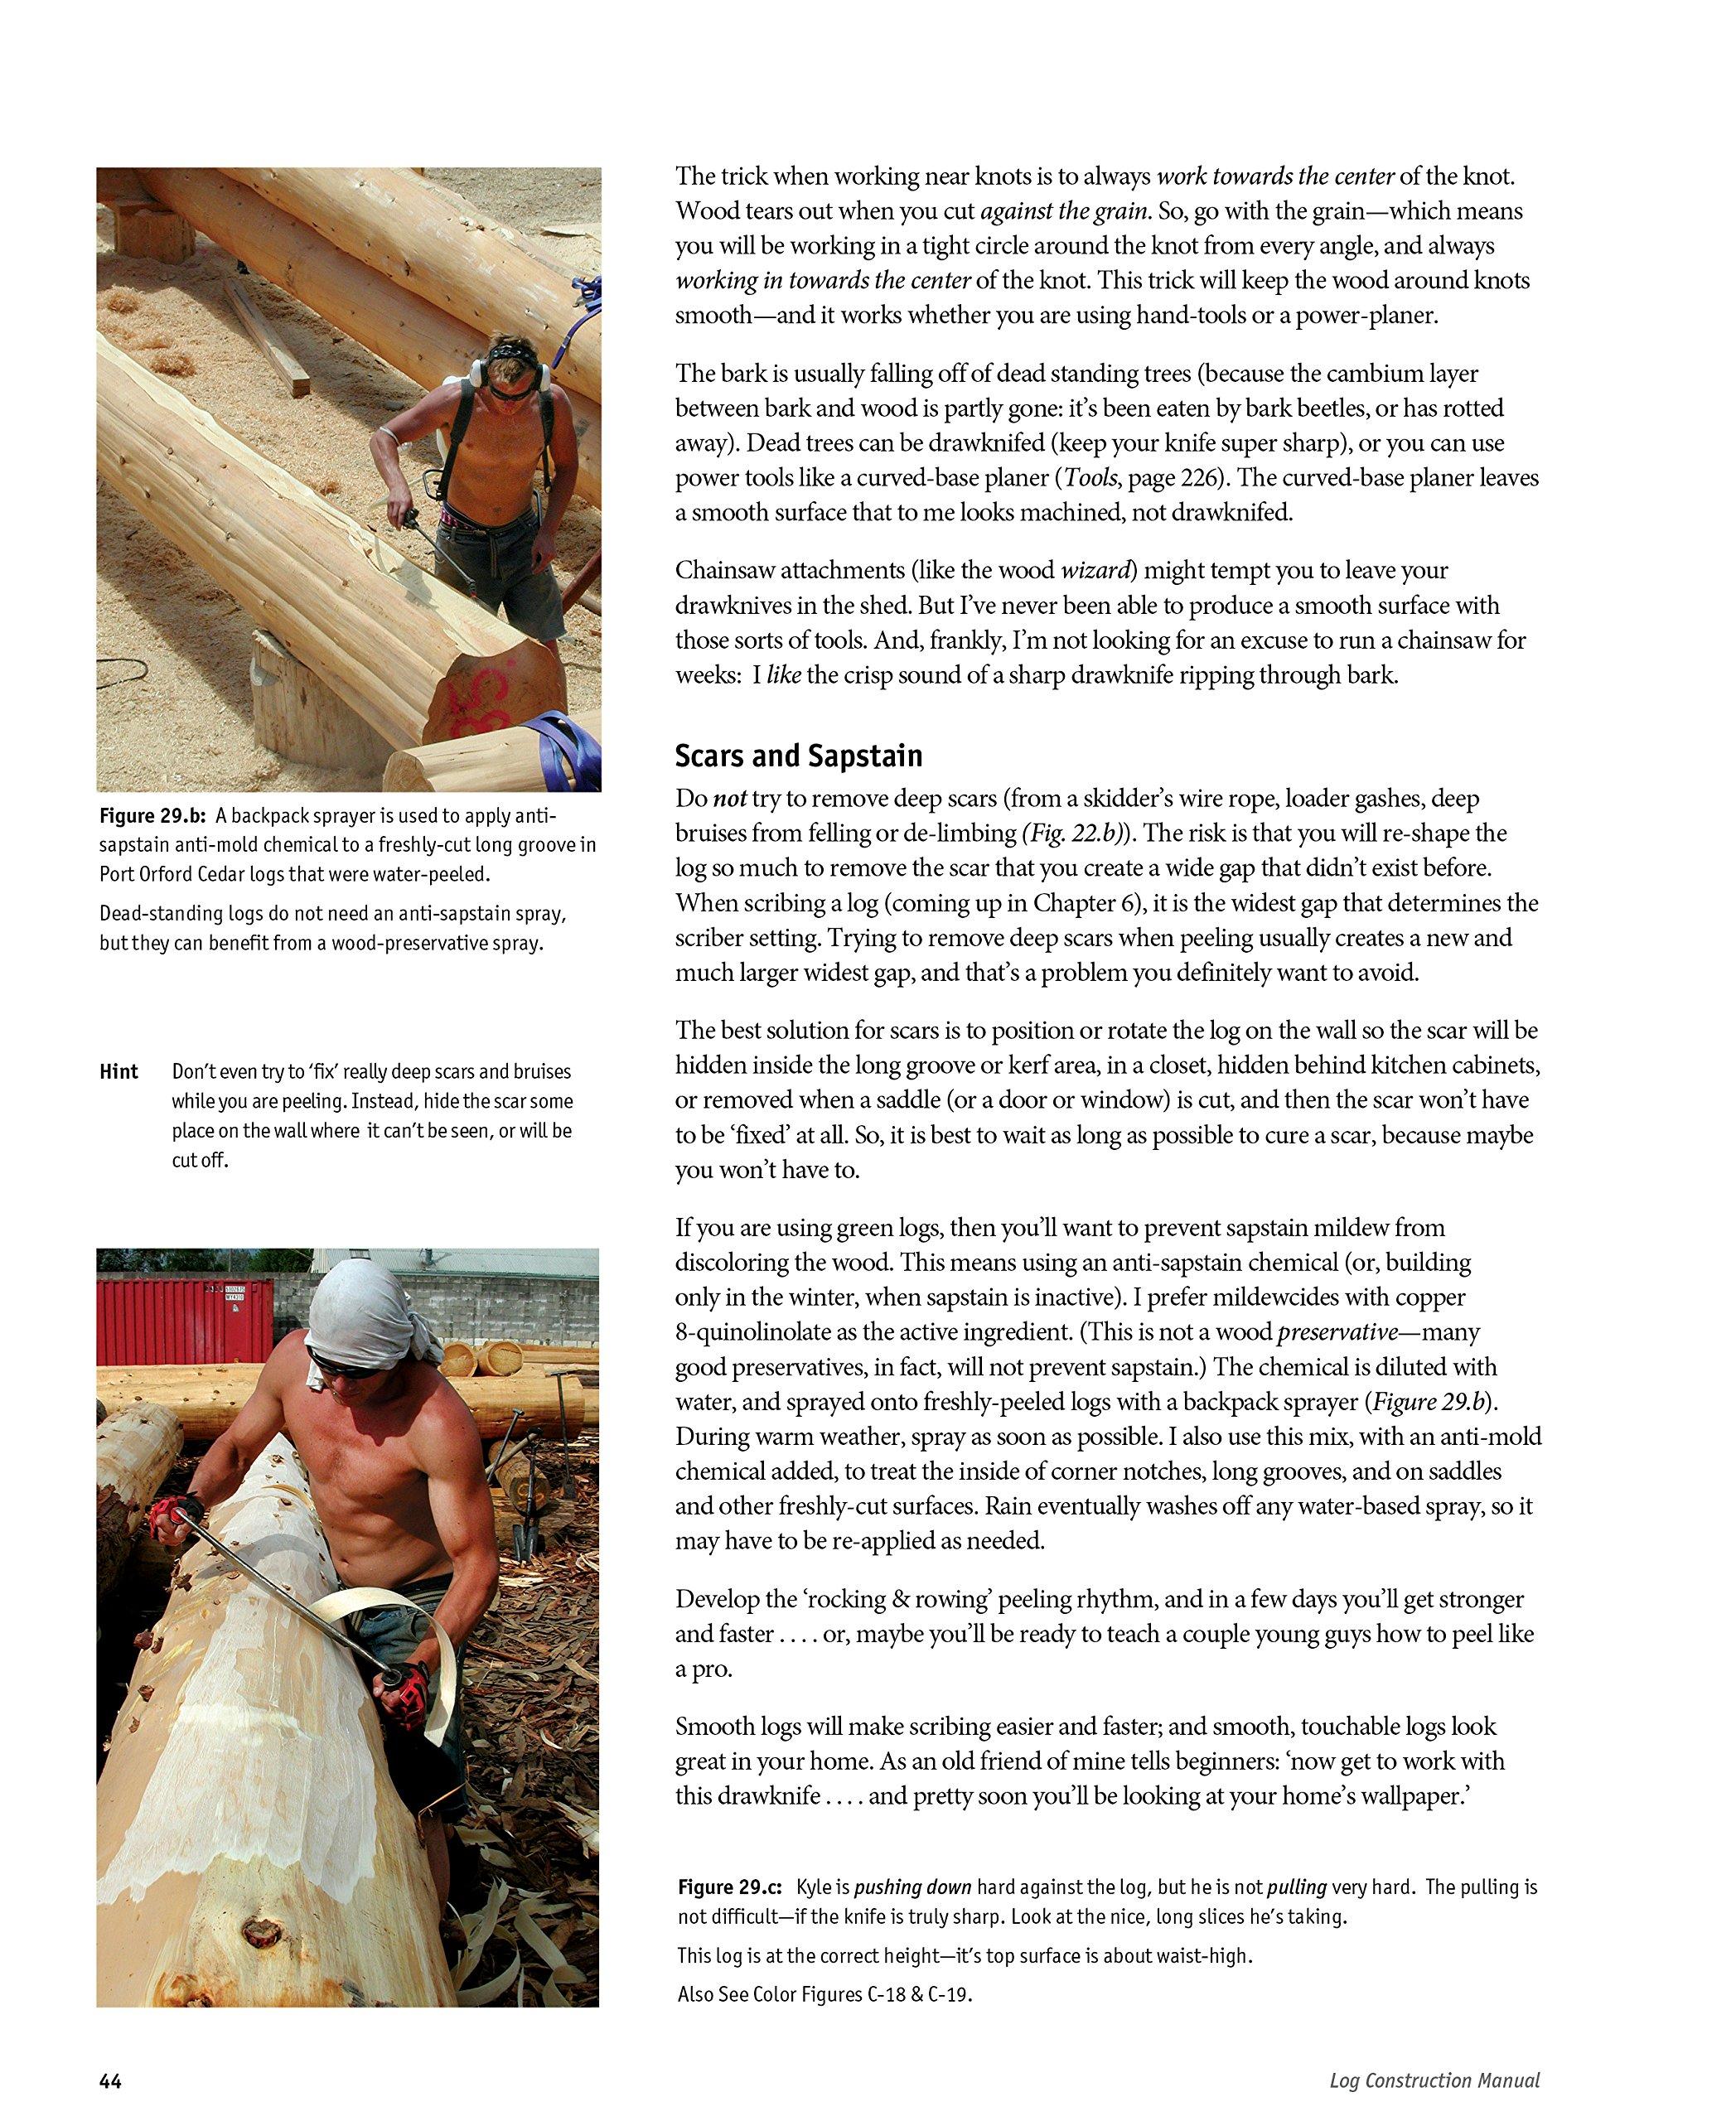 Log Construction Manual - Full Color Edition: Robert W